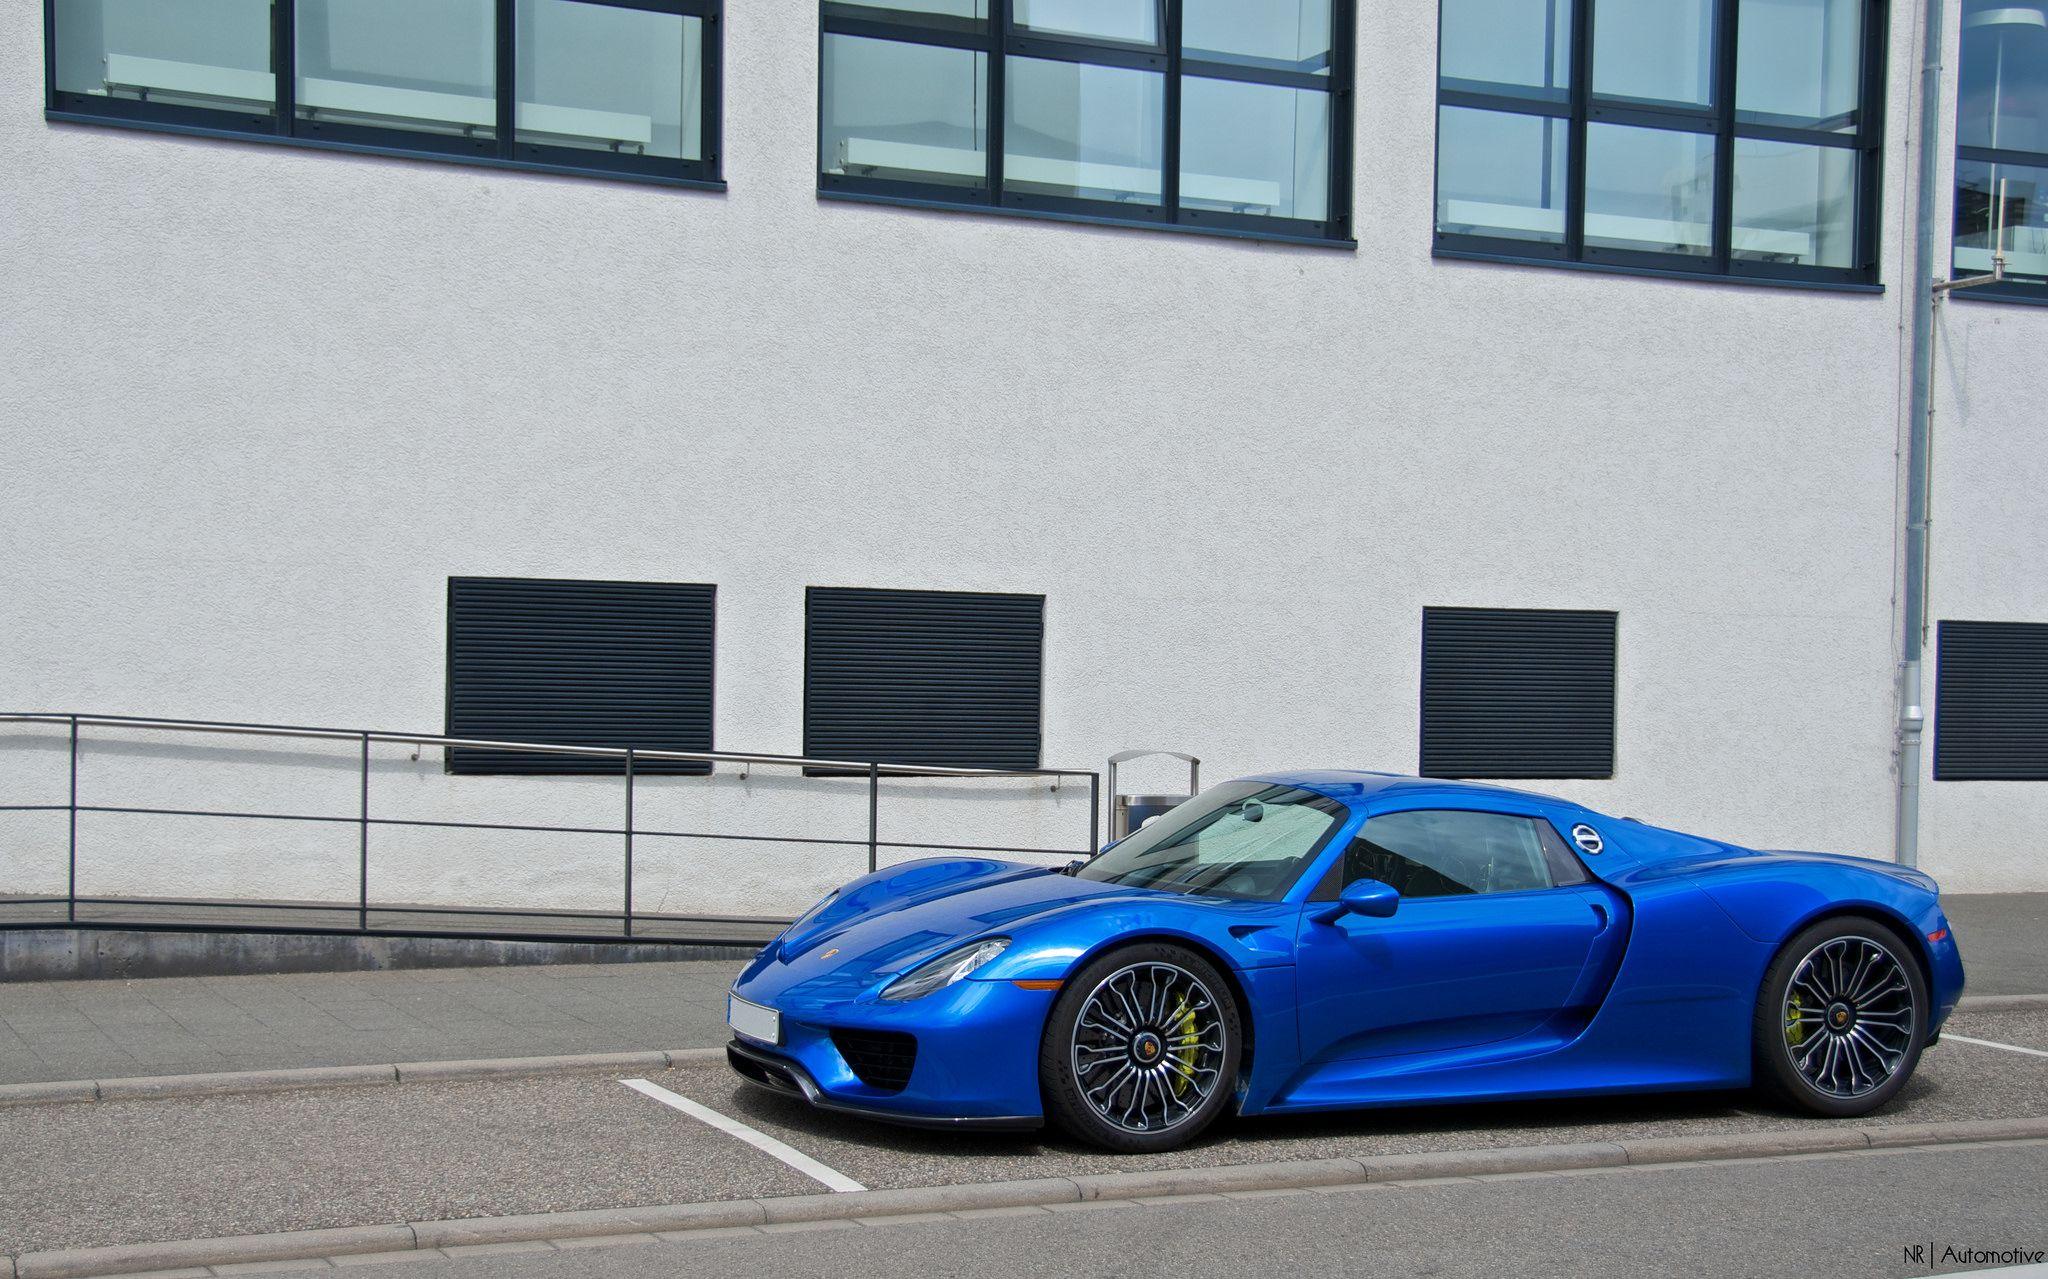 8921038e984defe2dda15ea902b48b16 Astounding where are Porsche 918 Spyder Location Cars Trend